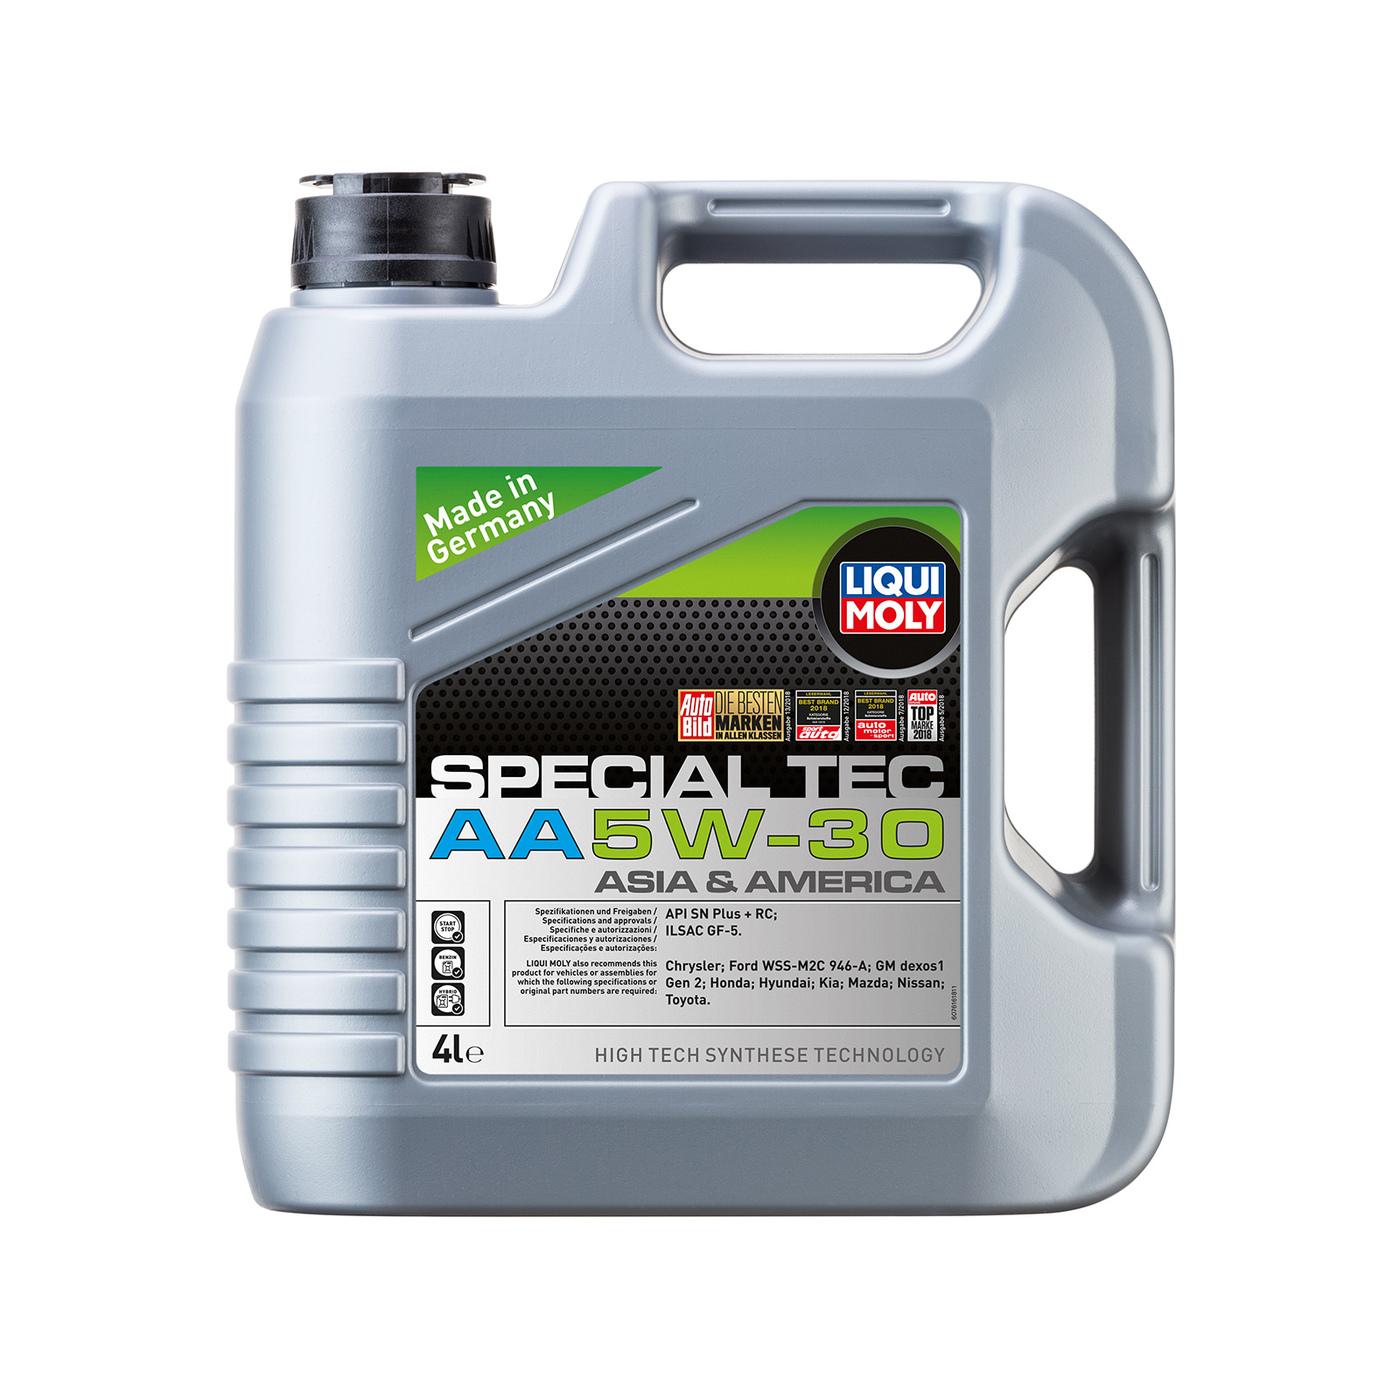 Моторное масло НС-синтетическое Liqui Moly Special Tec AA 5W-30 SN GF-5 (4л) 7516